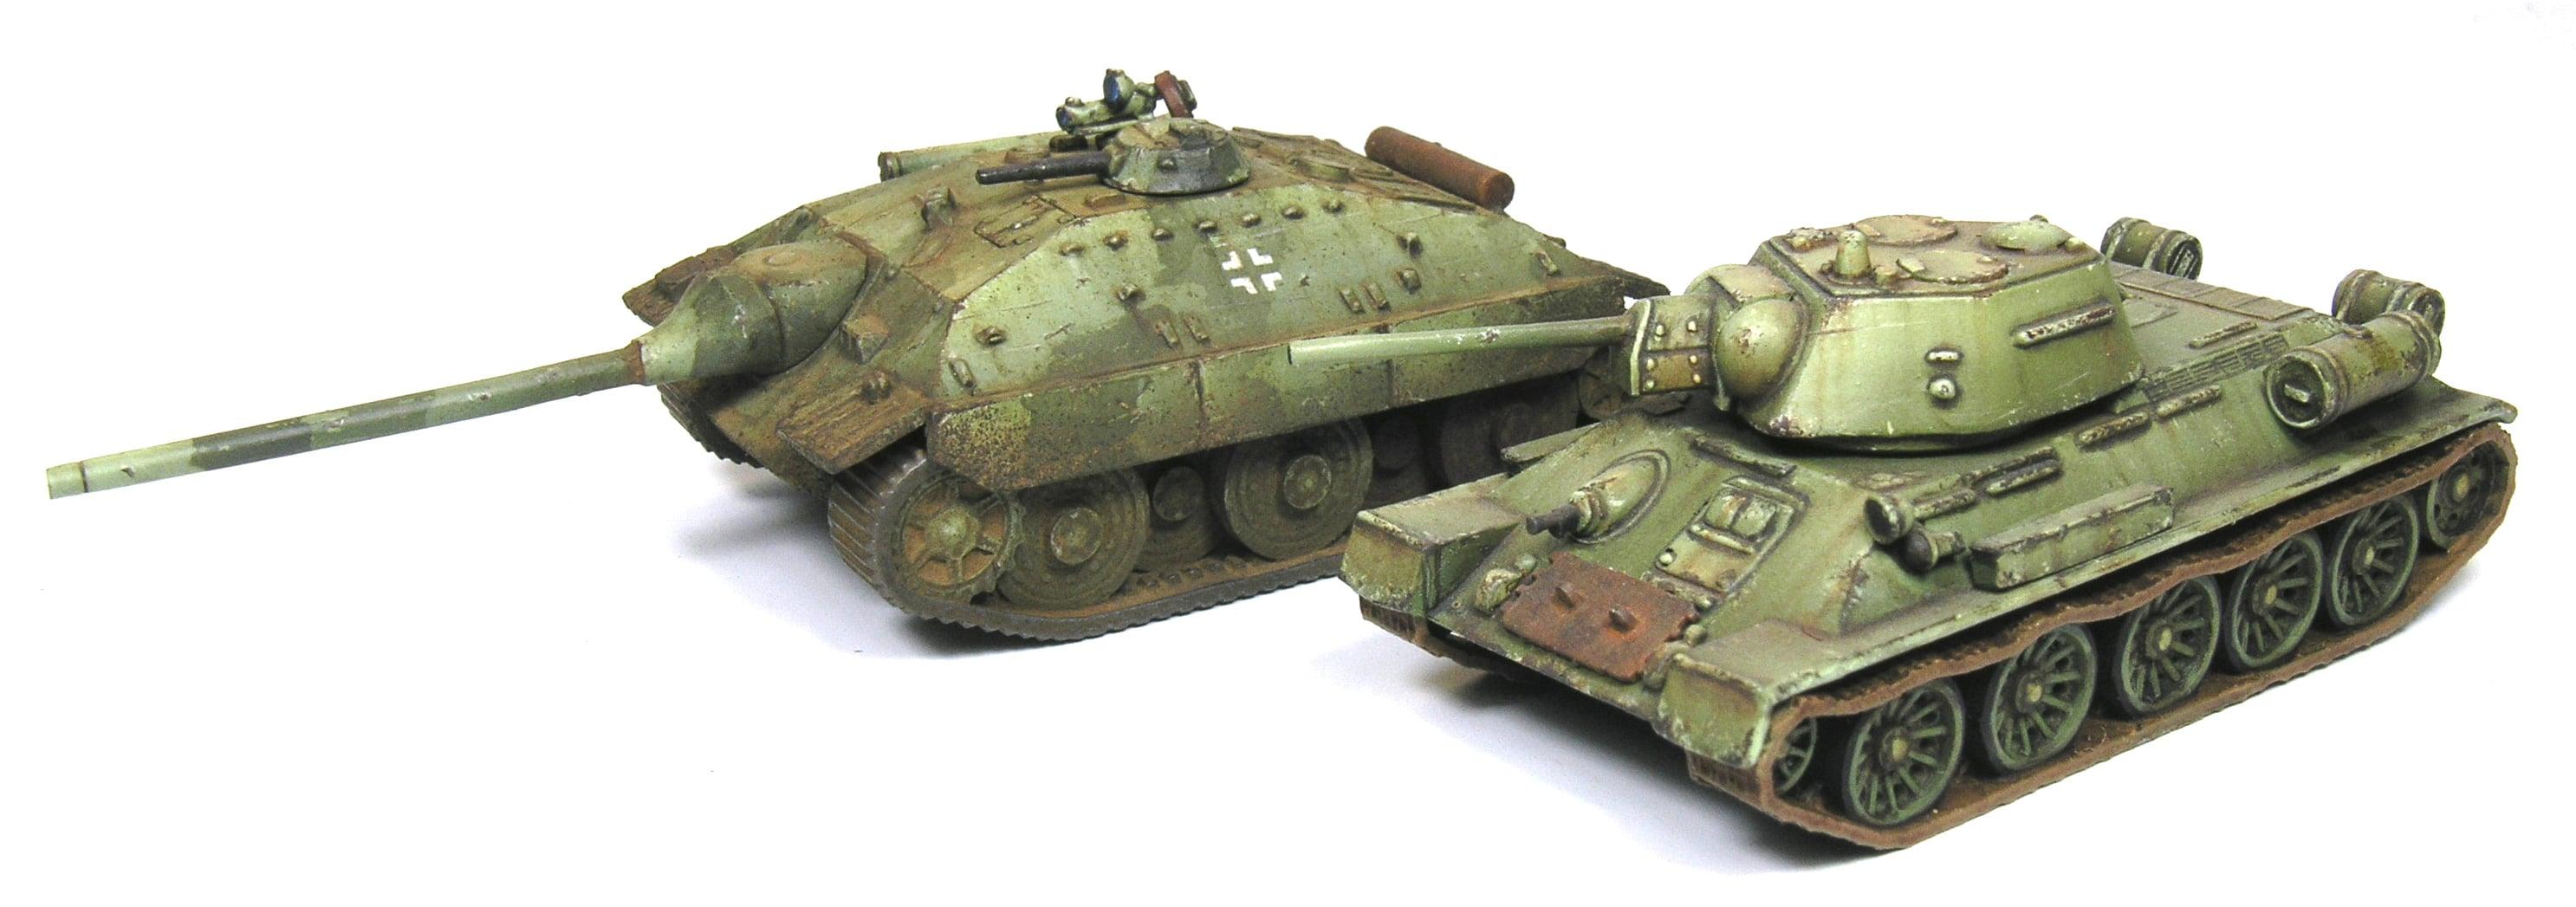 Pintando tanques en 15mm: tanque E25 - Painting 15mm tanks: E25 tank